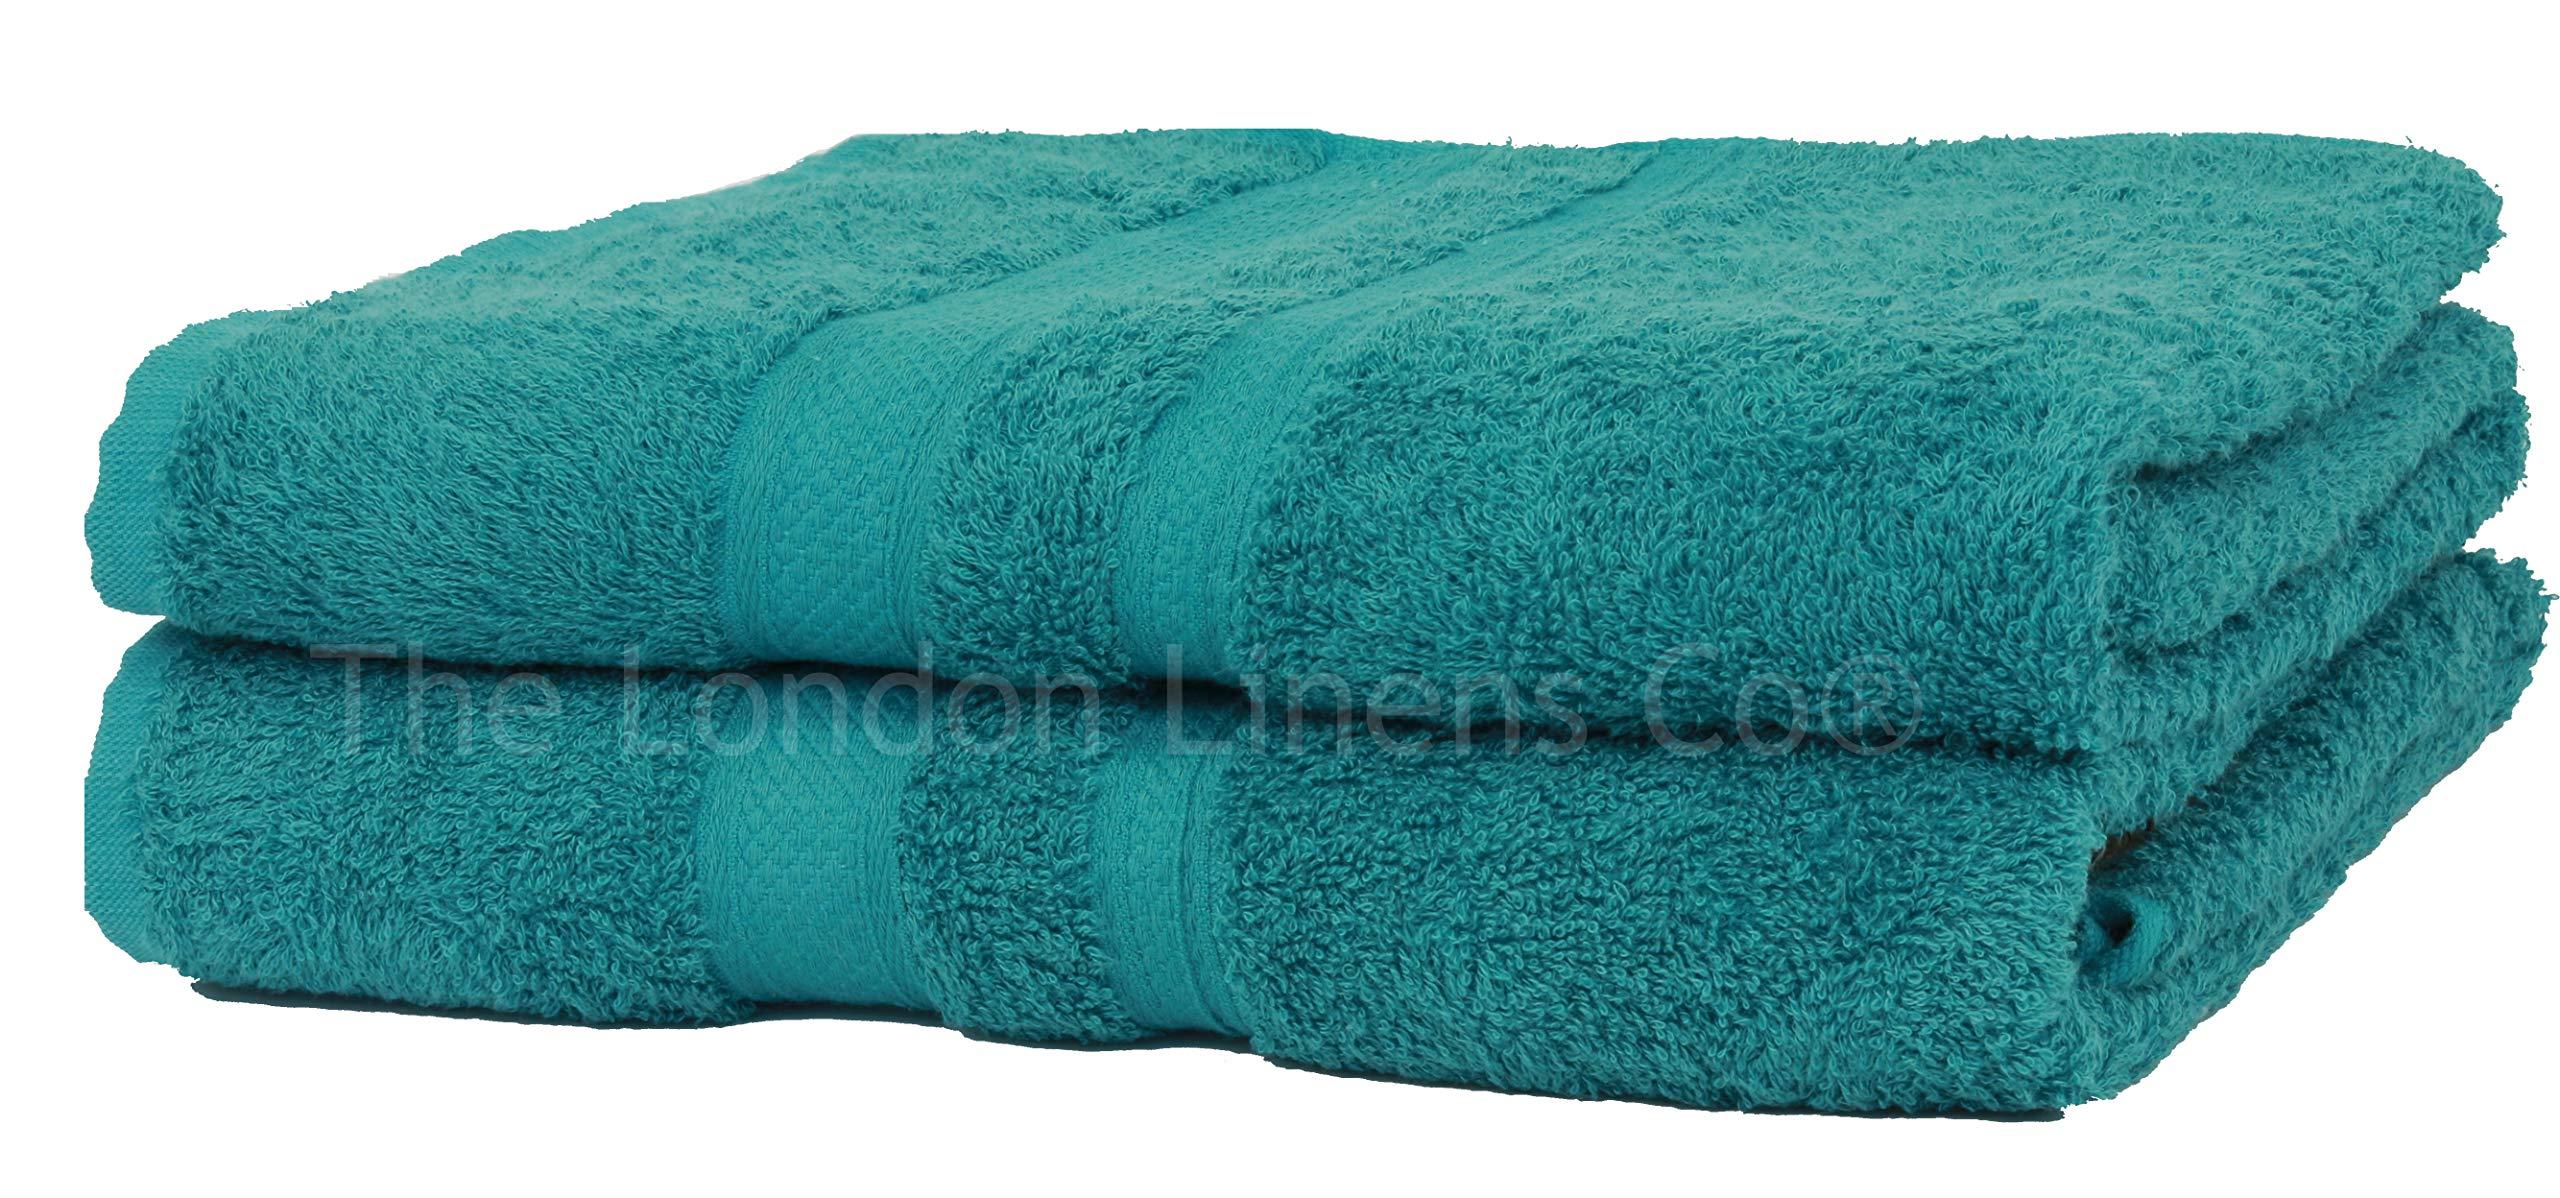 NAUSHA 2 x Super Large Bath Sheets Towels 100/% Egyptian Cotton 600 GSM Royal Blue